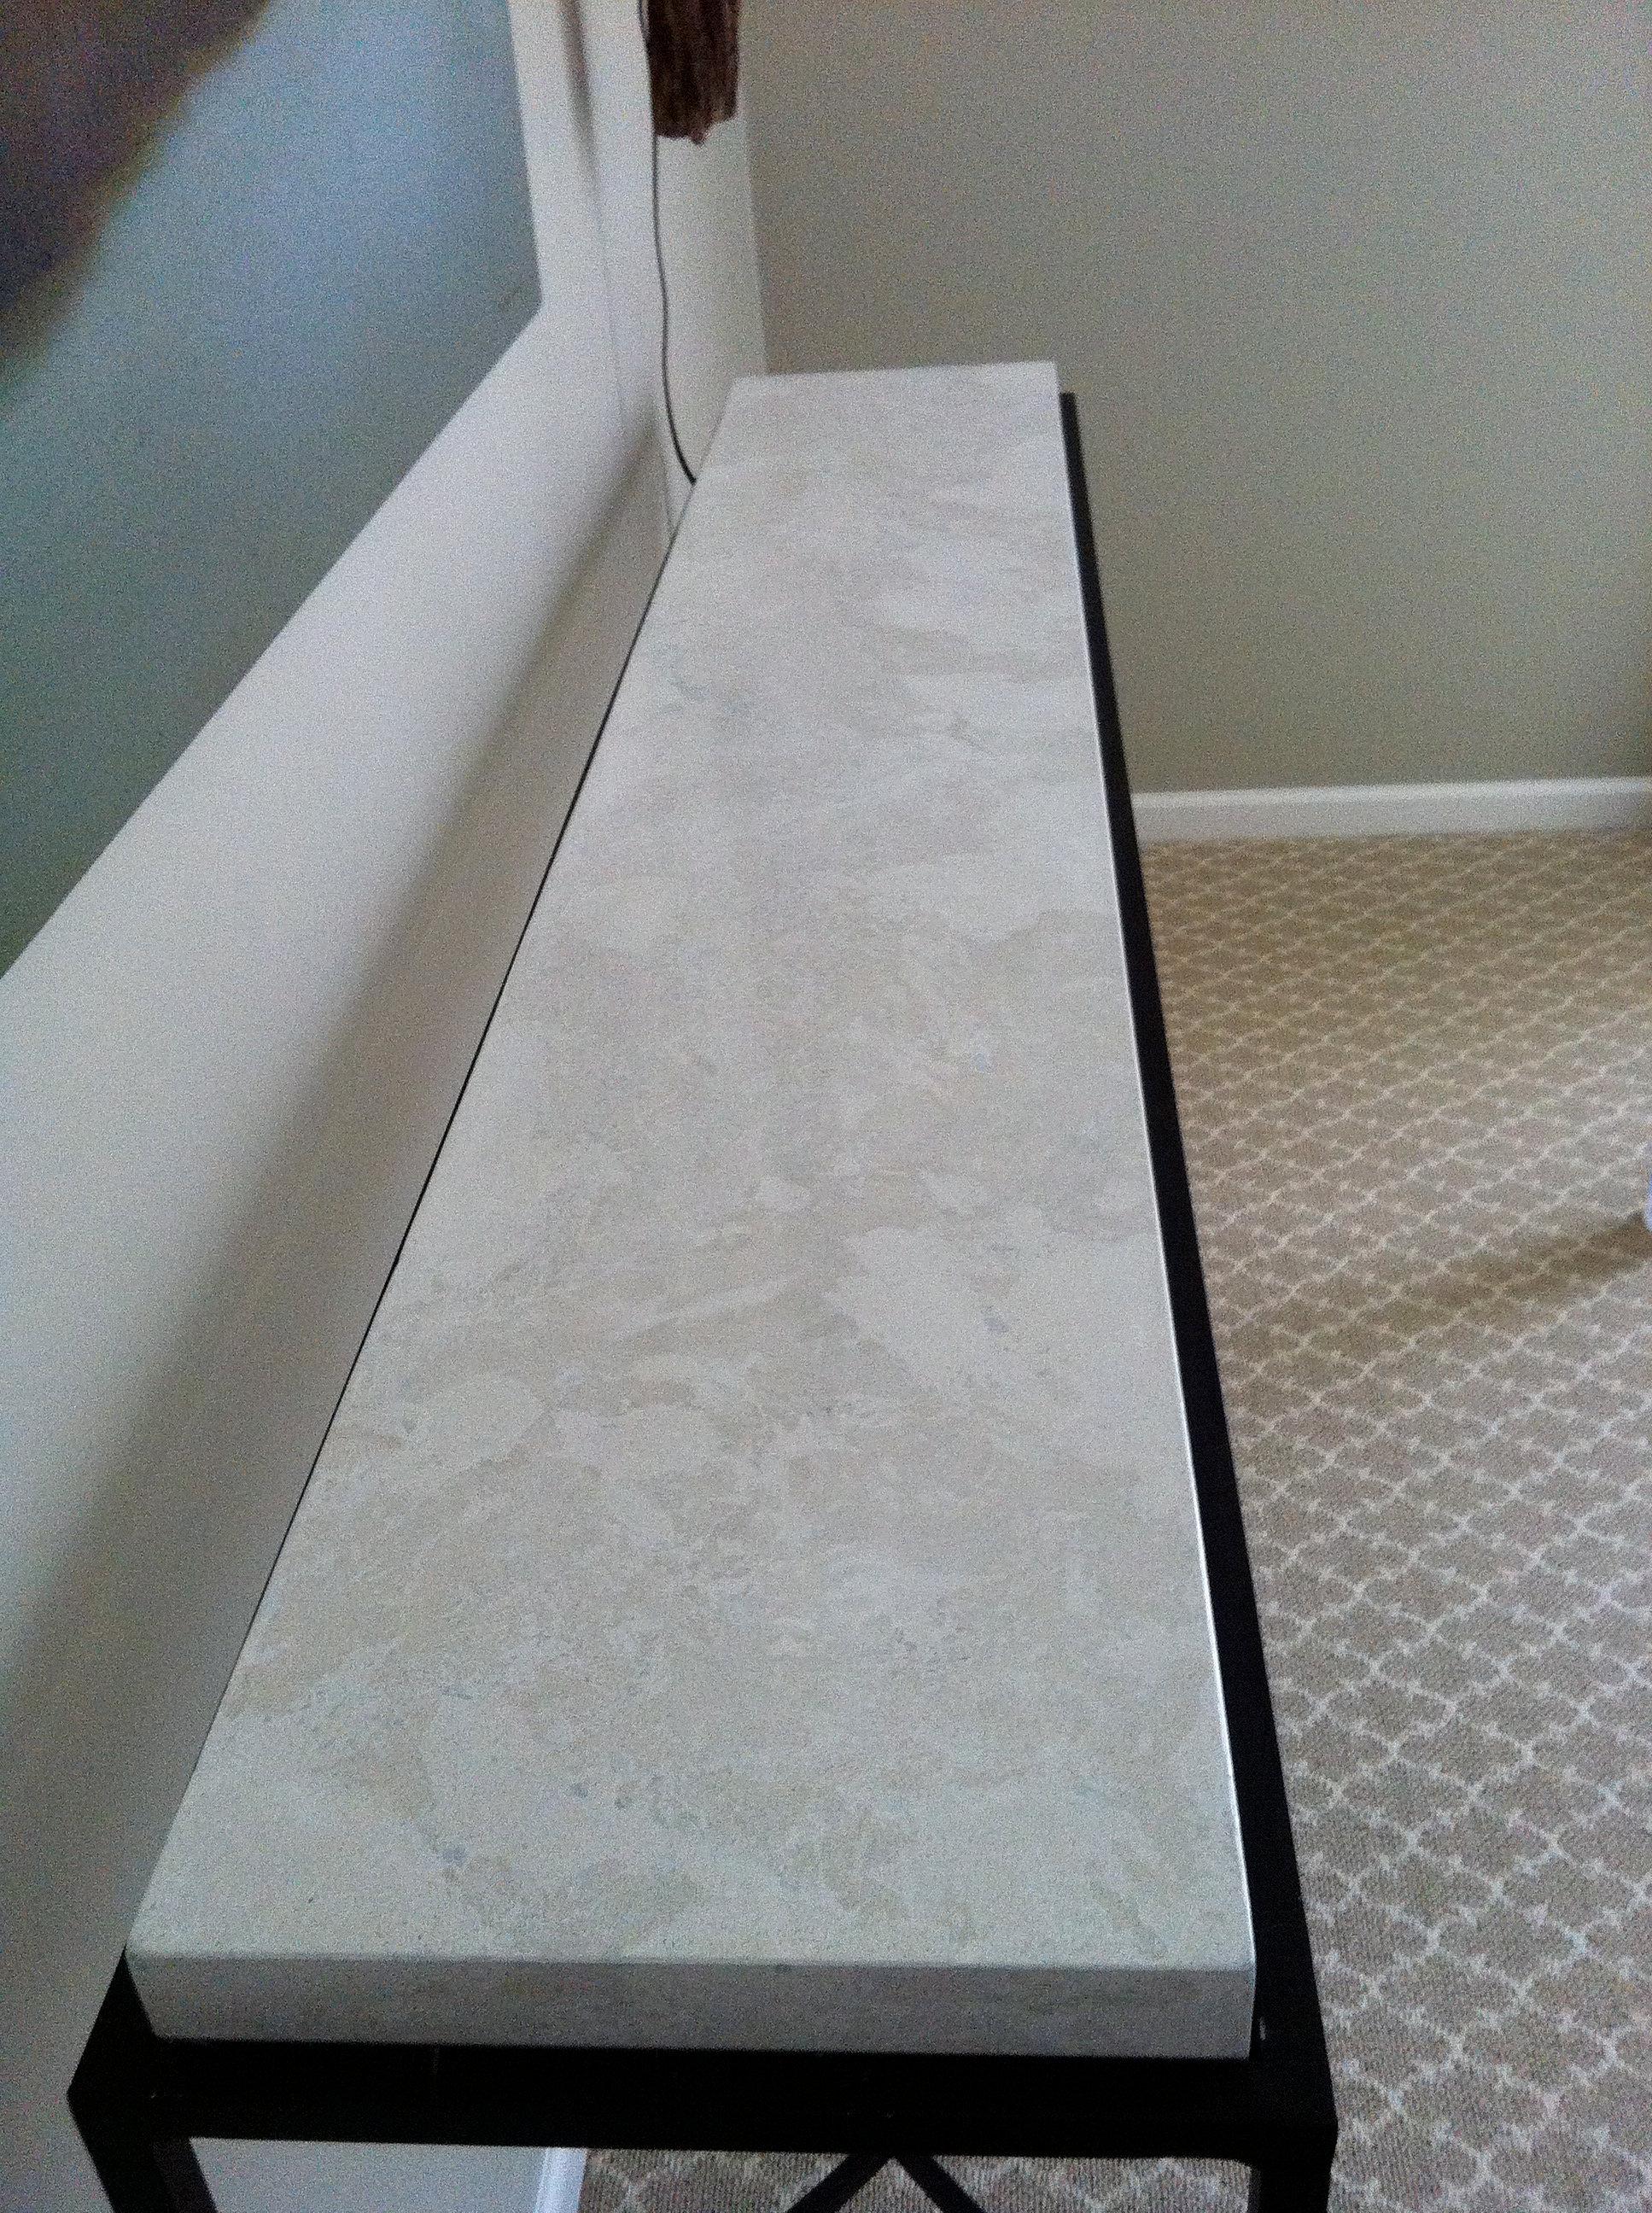 Concrete Countertops Atlanta  Concrete sinks  Burco Surface and